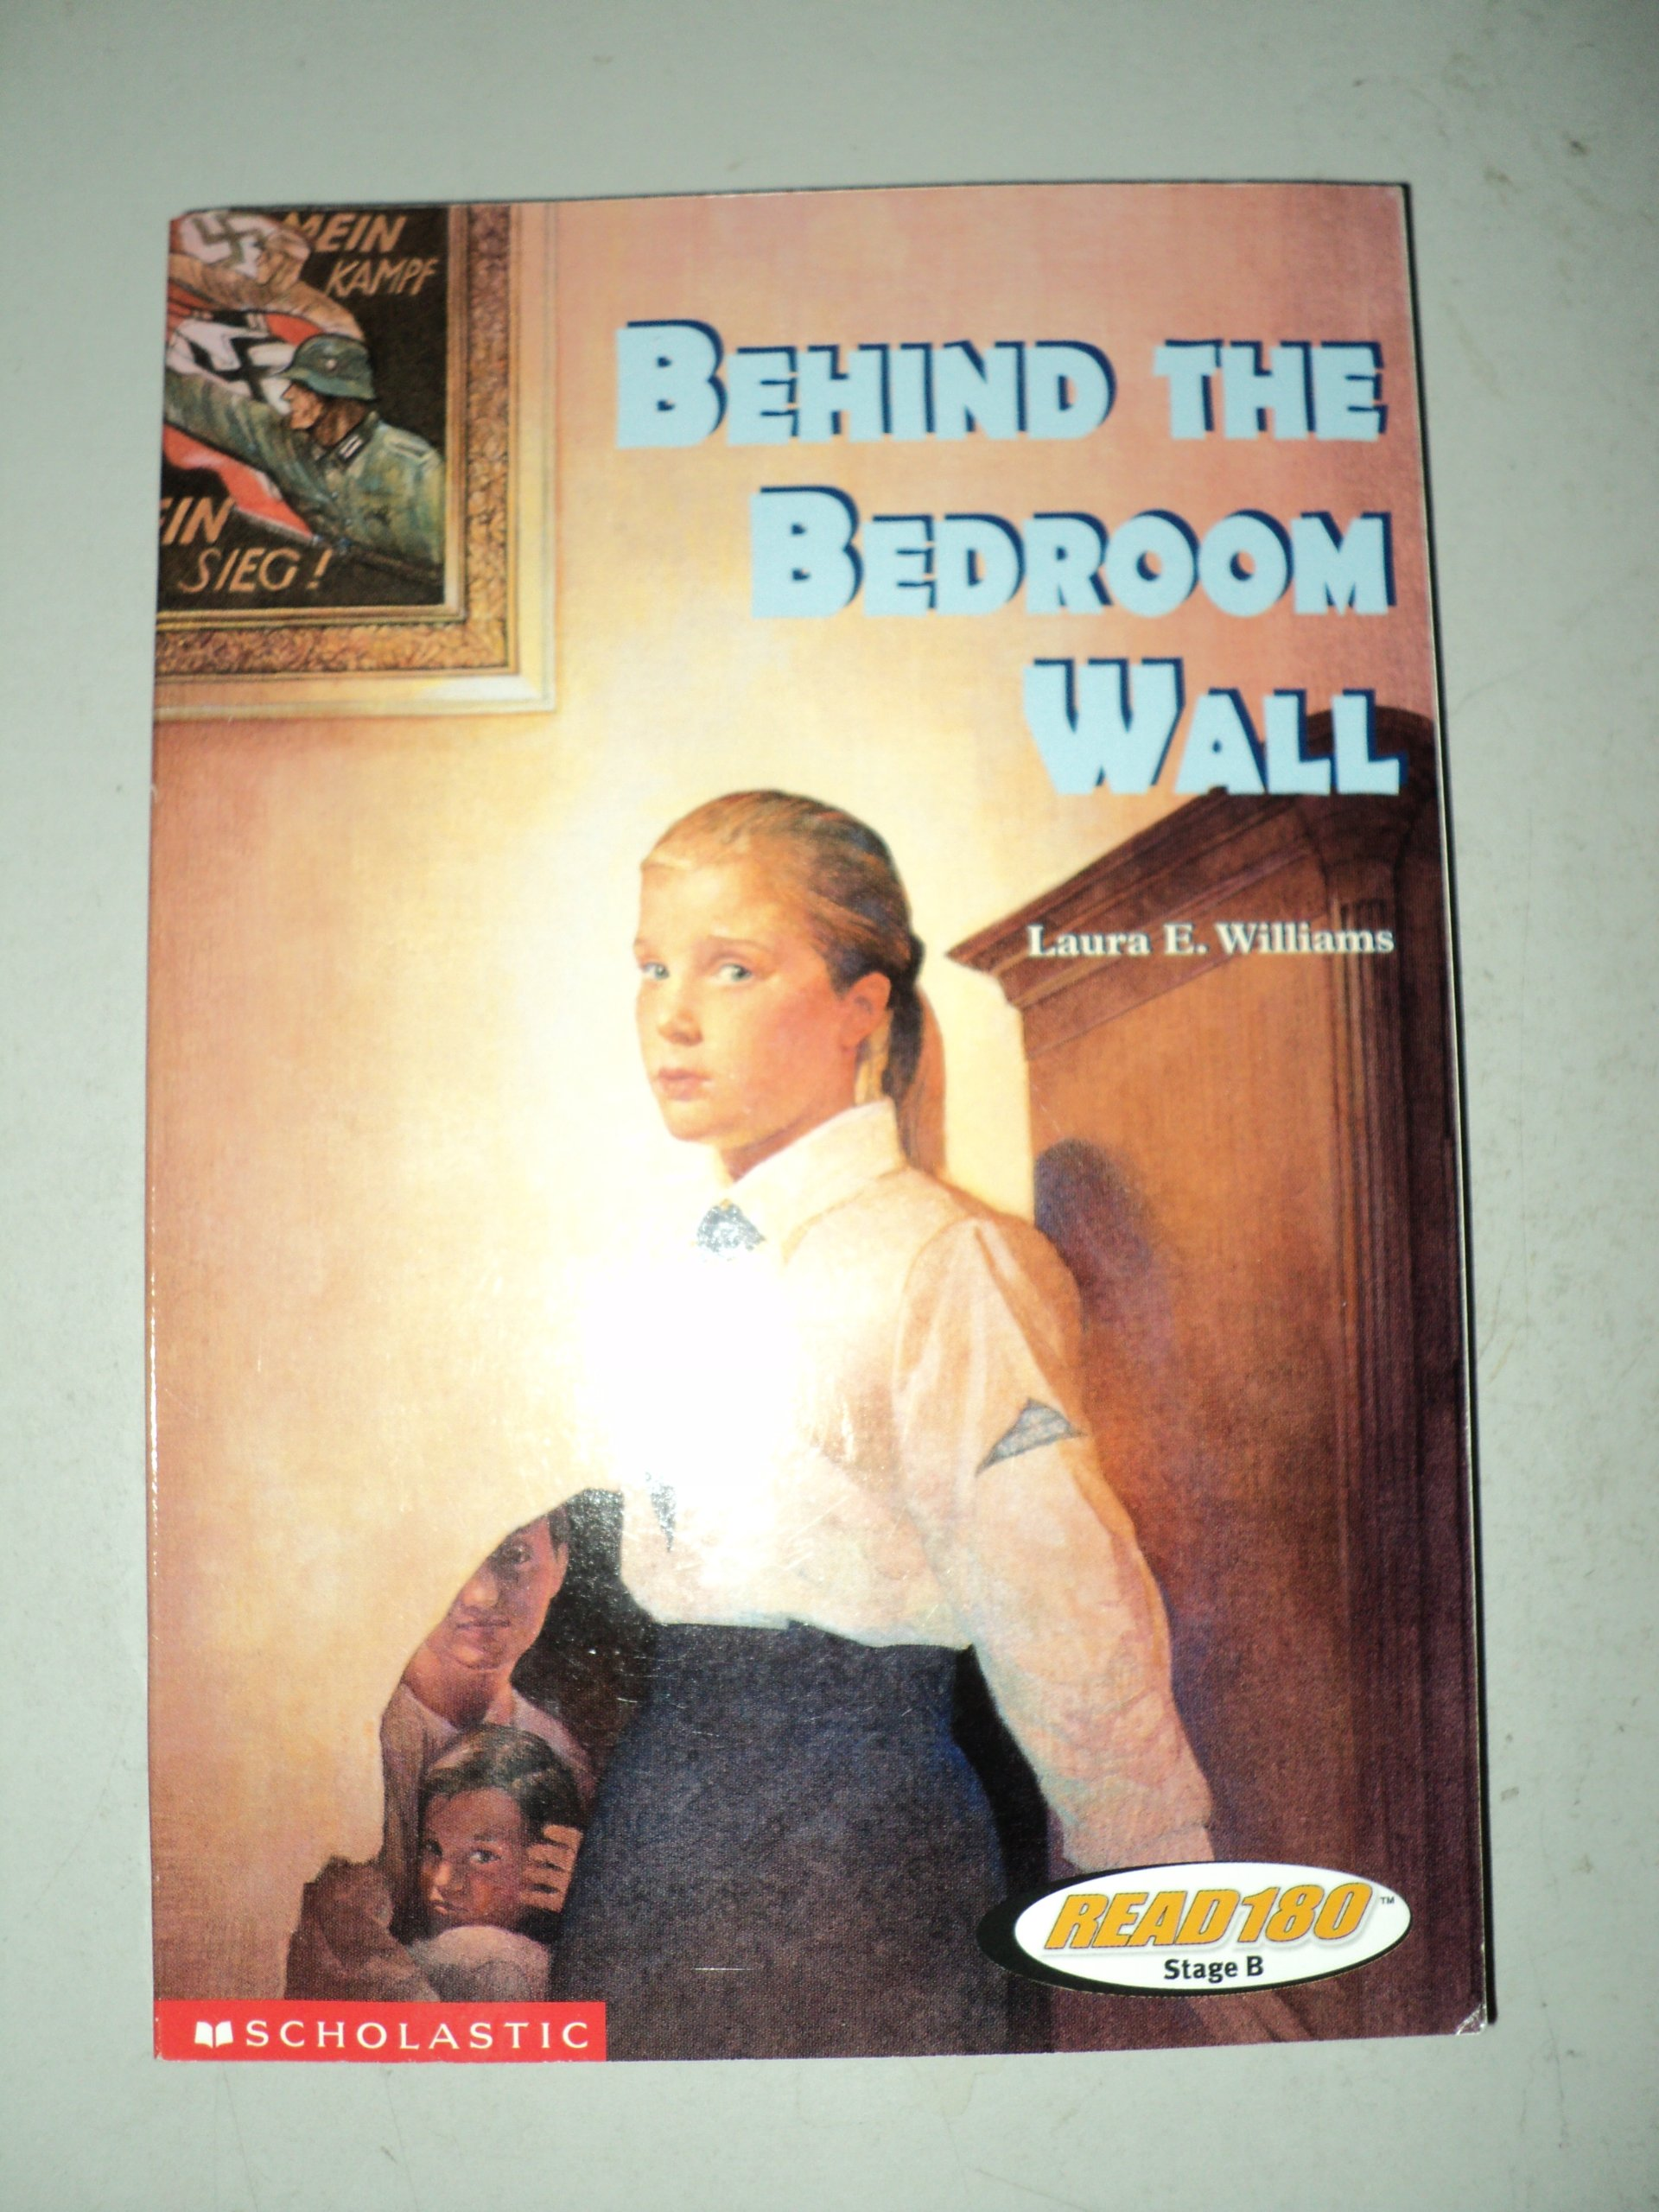 Behind the Bedroom Wall: 9780439315913: Books - Amazon.ca